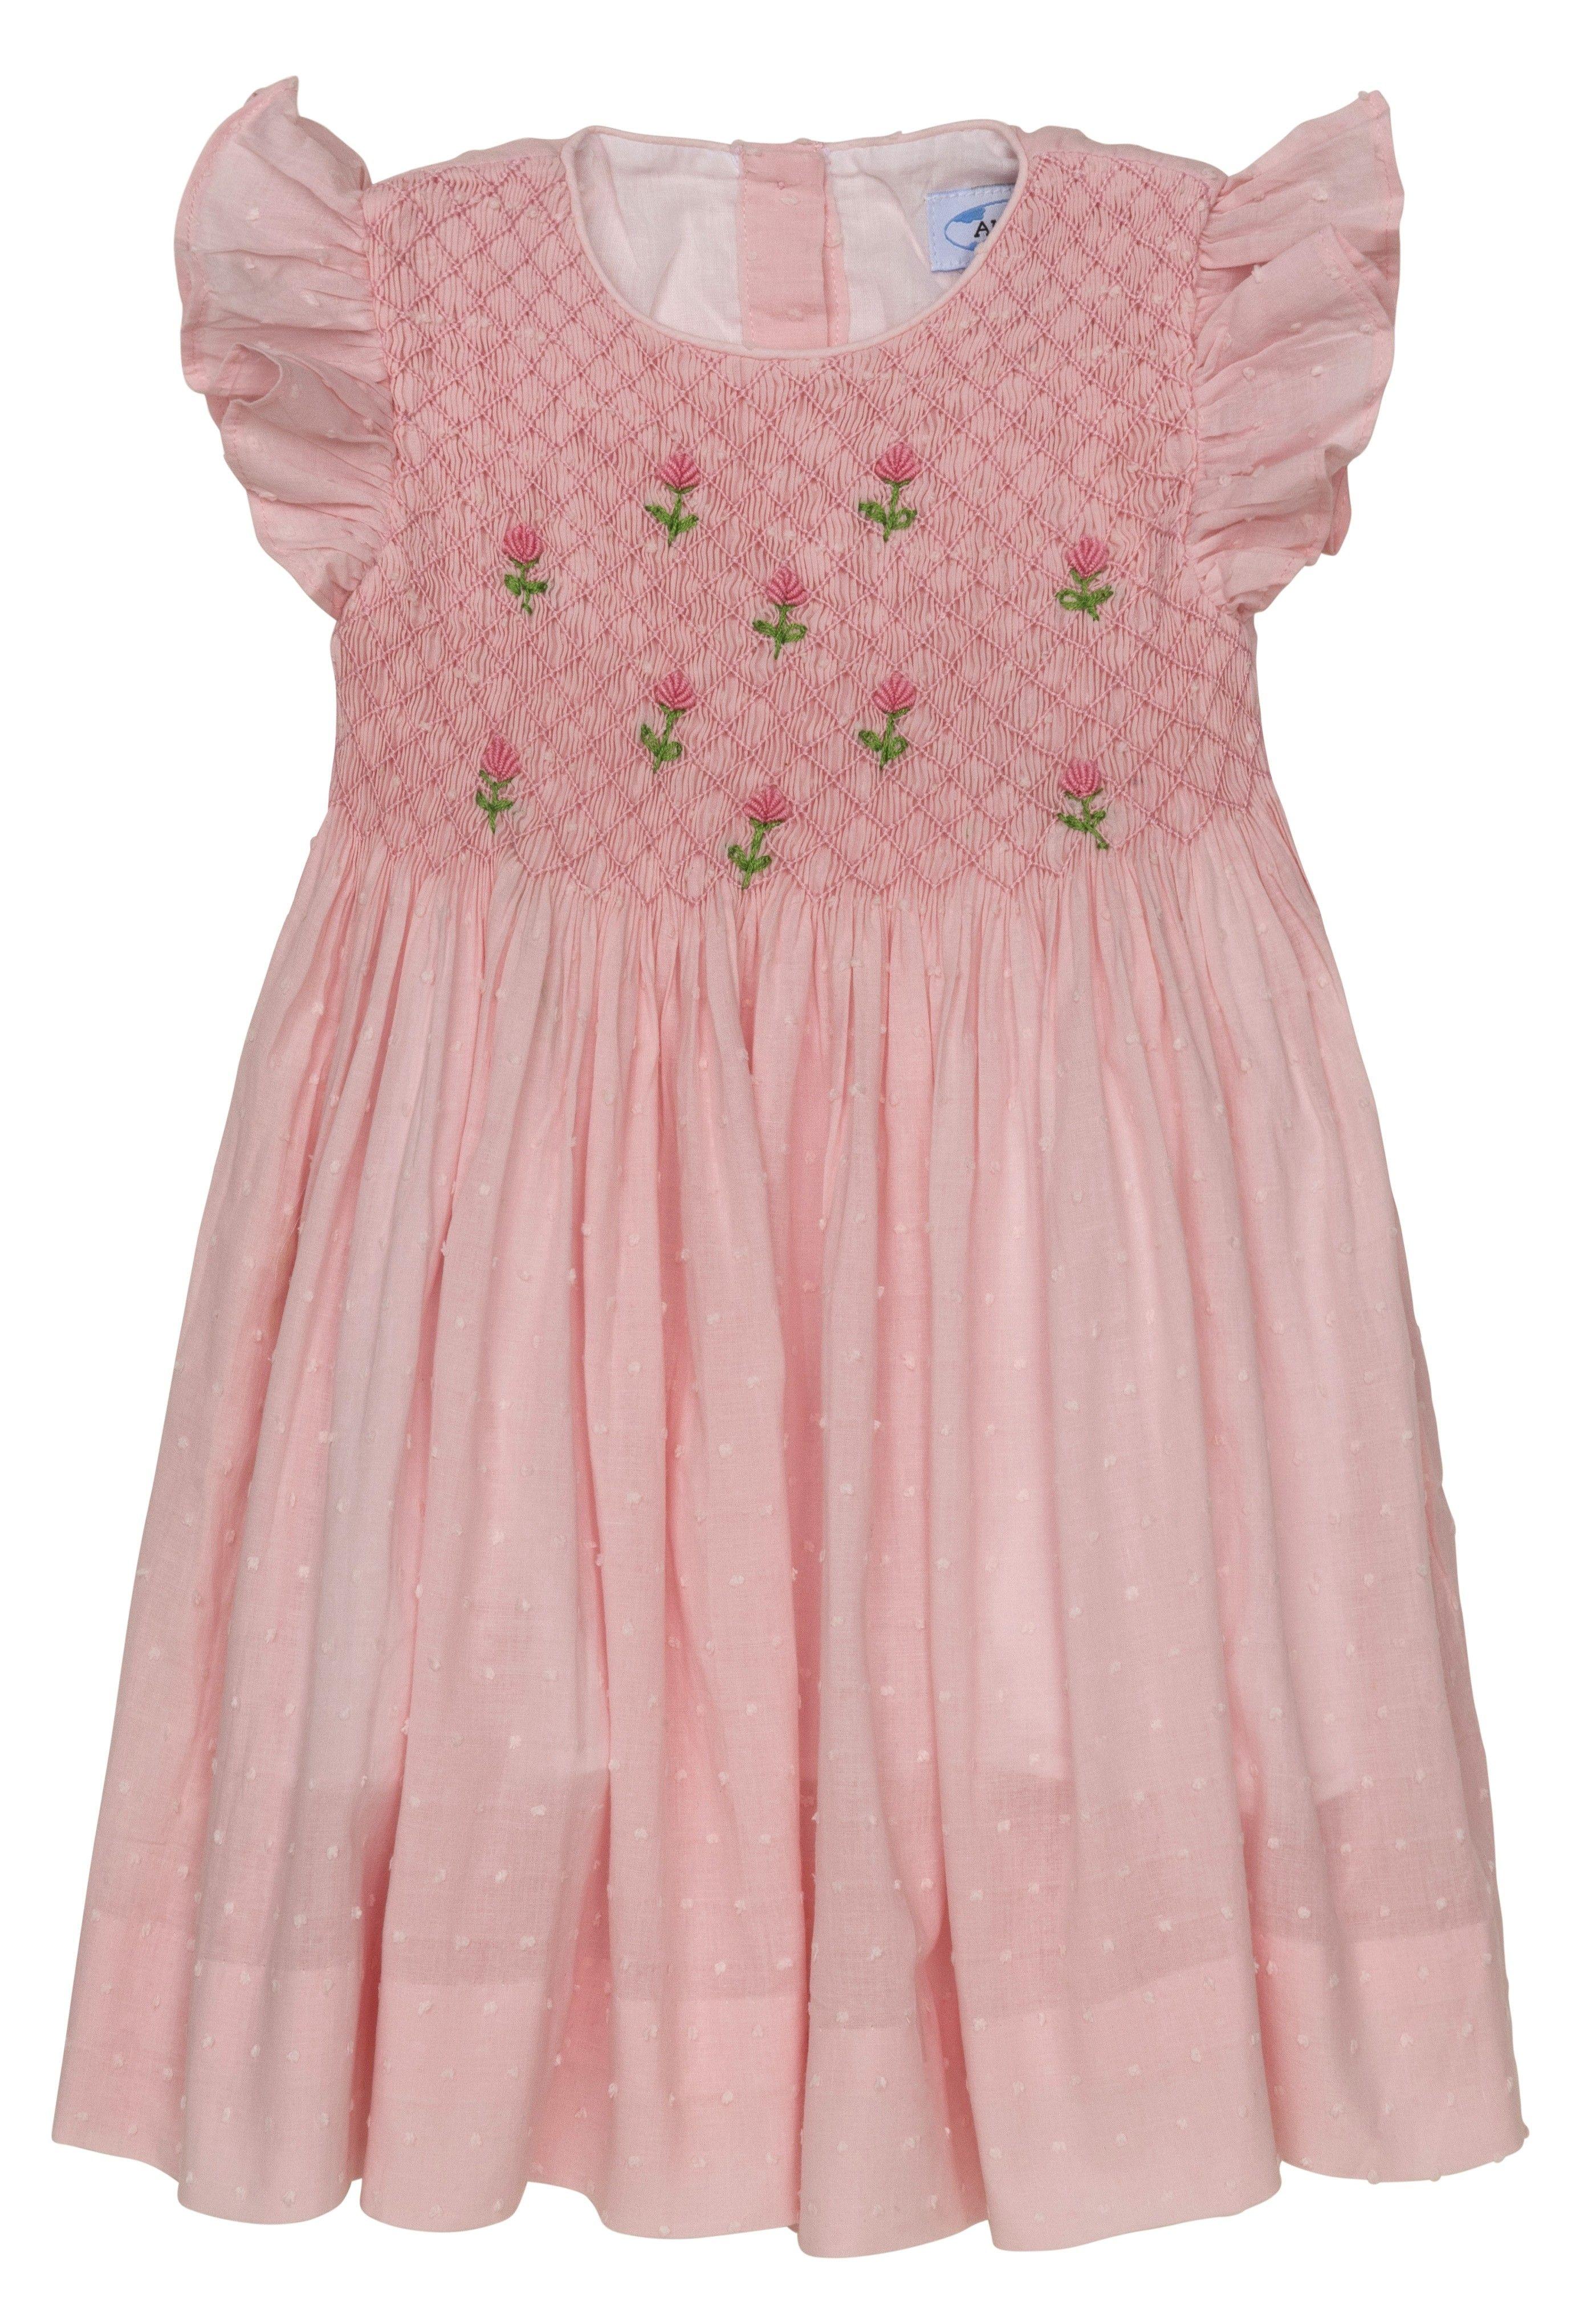 Aurora Royal English Rose Hand Smocked Hand Dress Limited Hand Smocked Toddler Girl Toddler Girl Dresses Hand Smocked Dress Girls Smocked Dresses